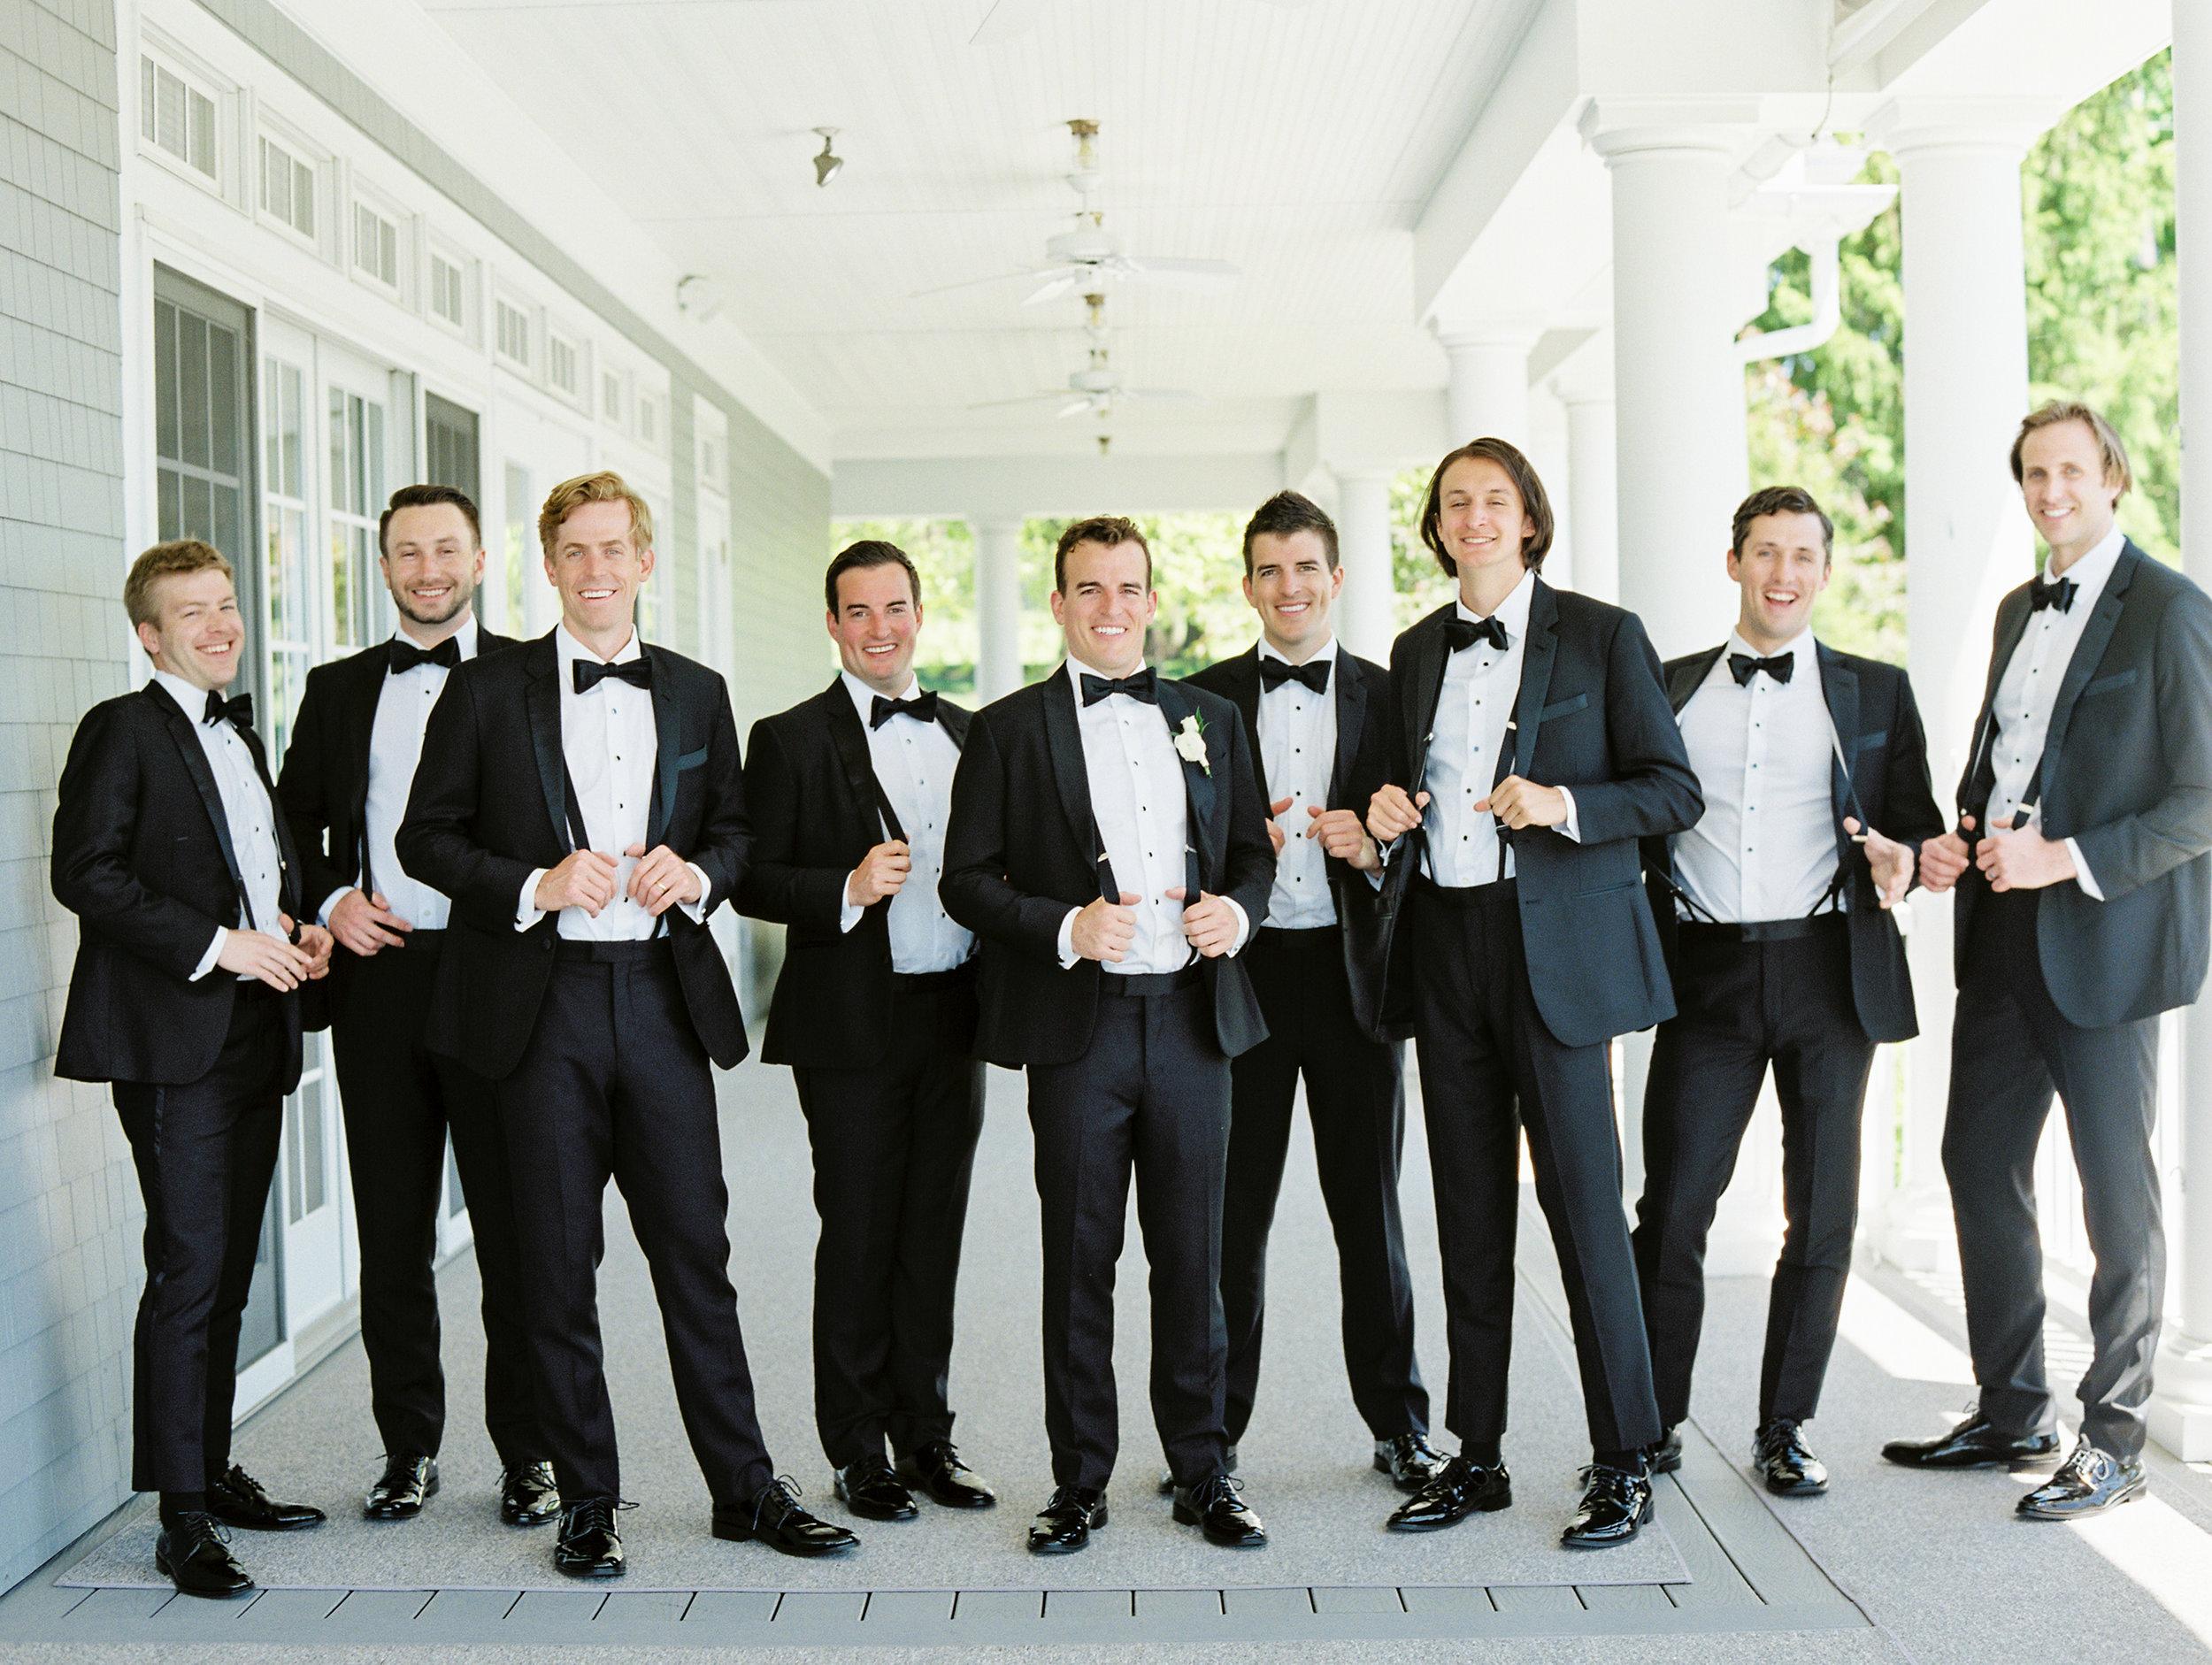 DeGuilio+Wedding+Bridal+Partyf-8.jpg